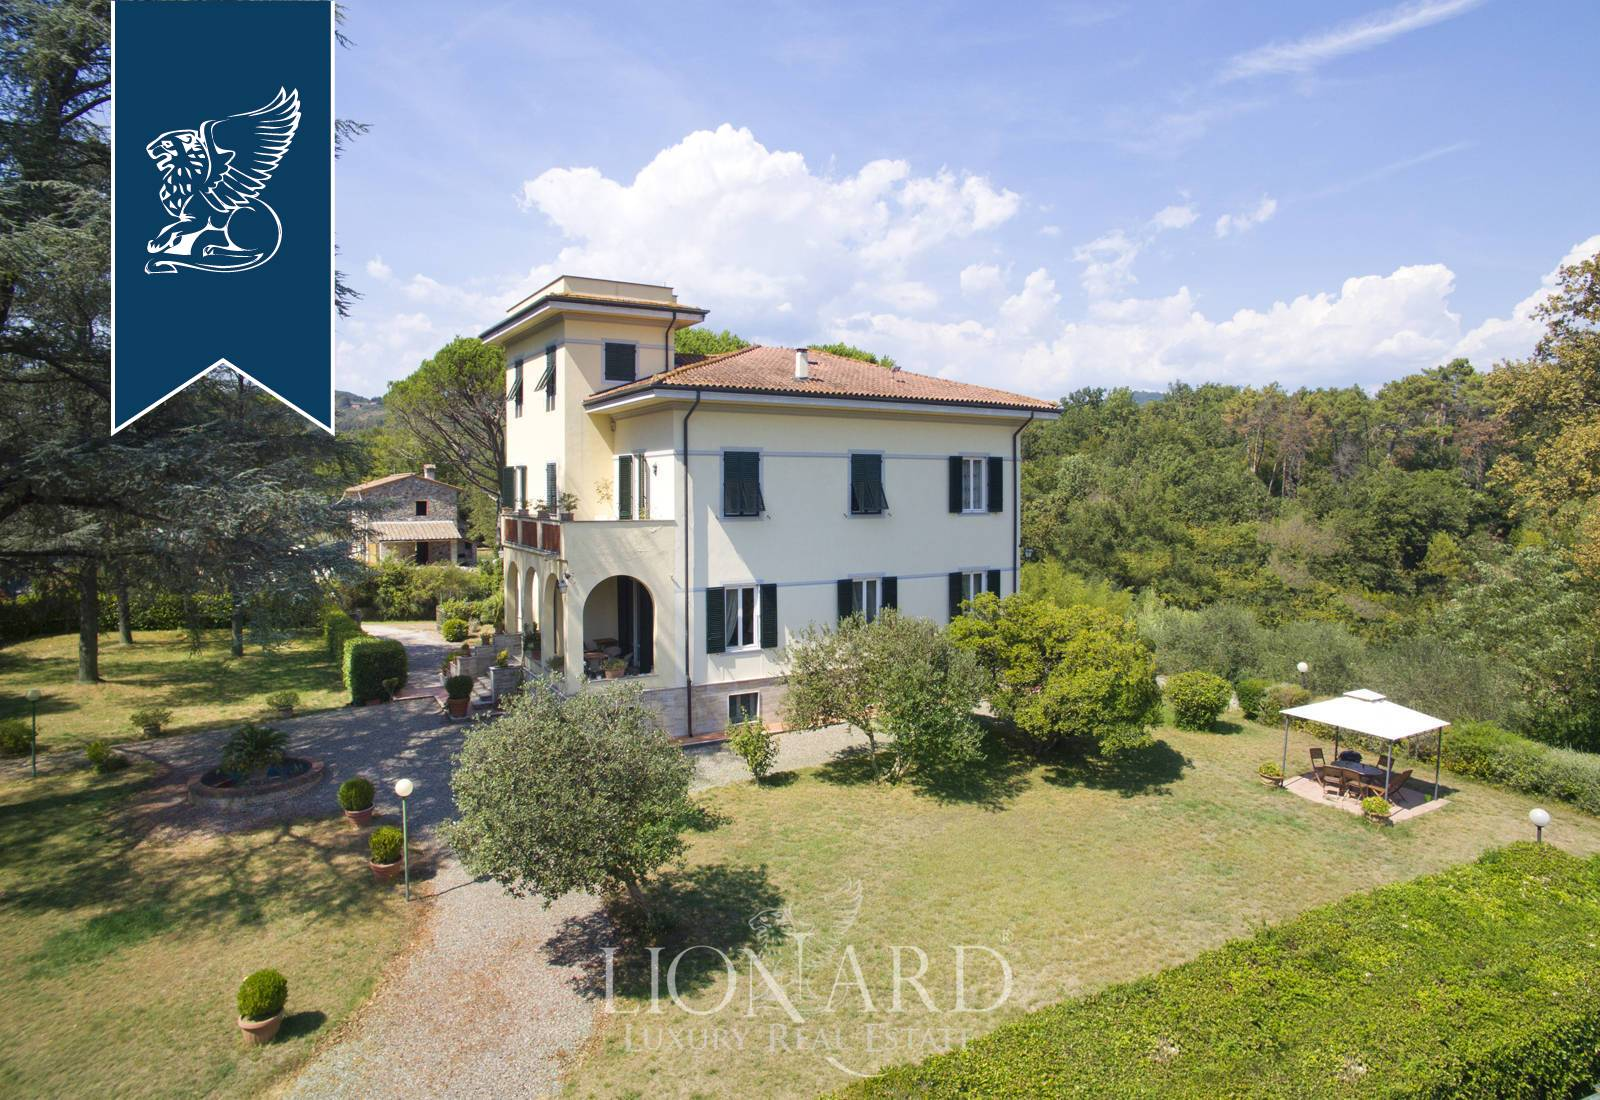 Villa in Vendita a Lucca: 0 locali, 600 mq - Foto 2